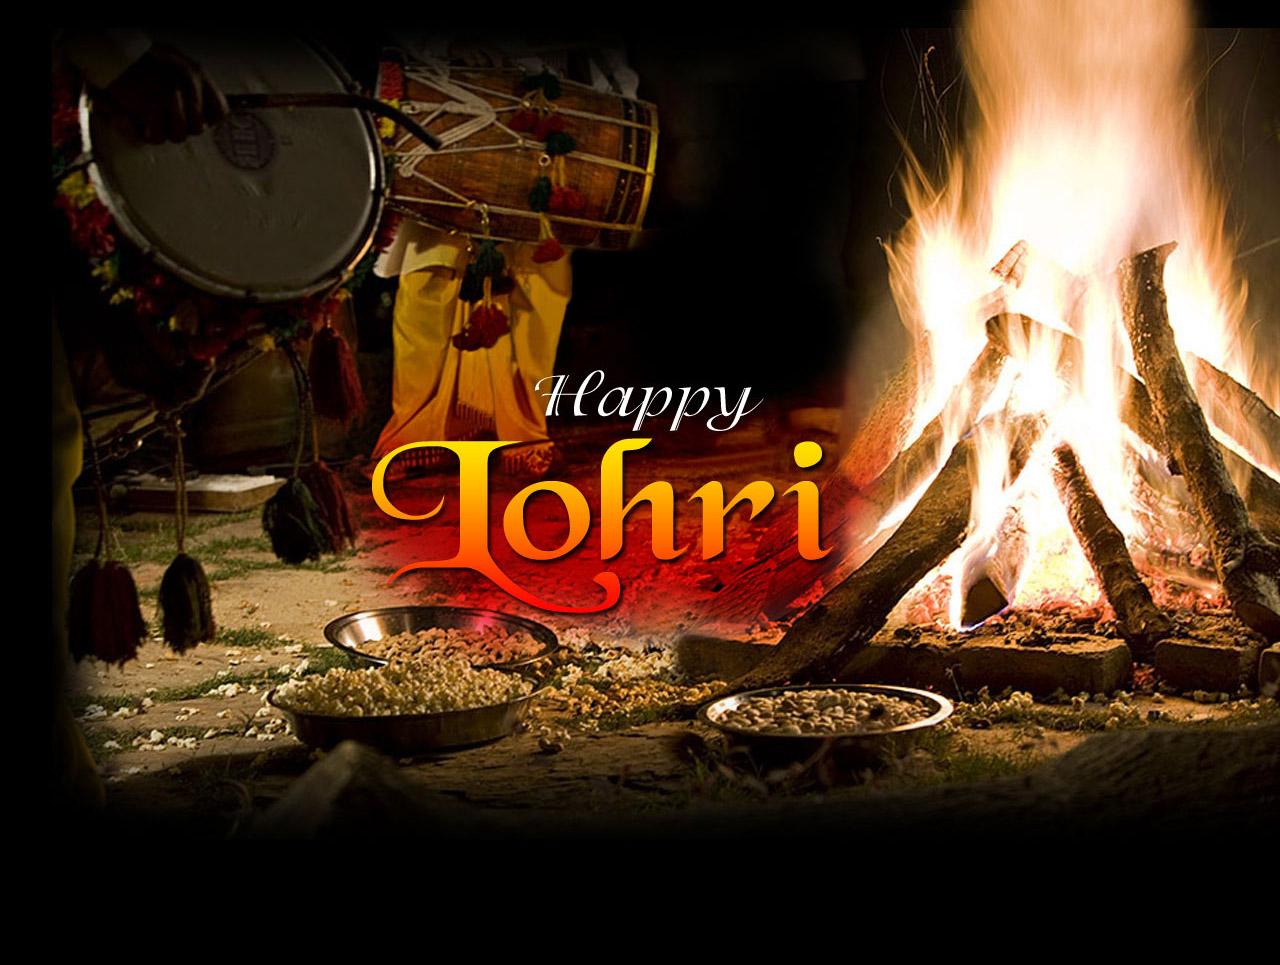 Happy Lohri WhatsApp Dp & Facebook Profile Picture